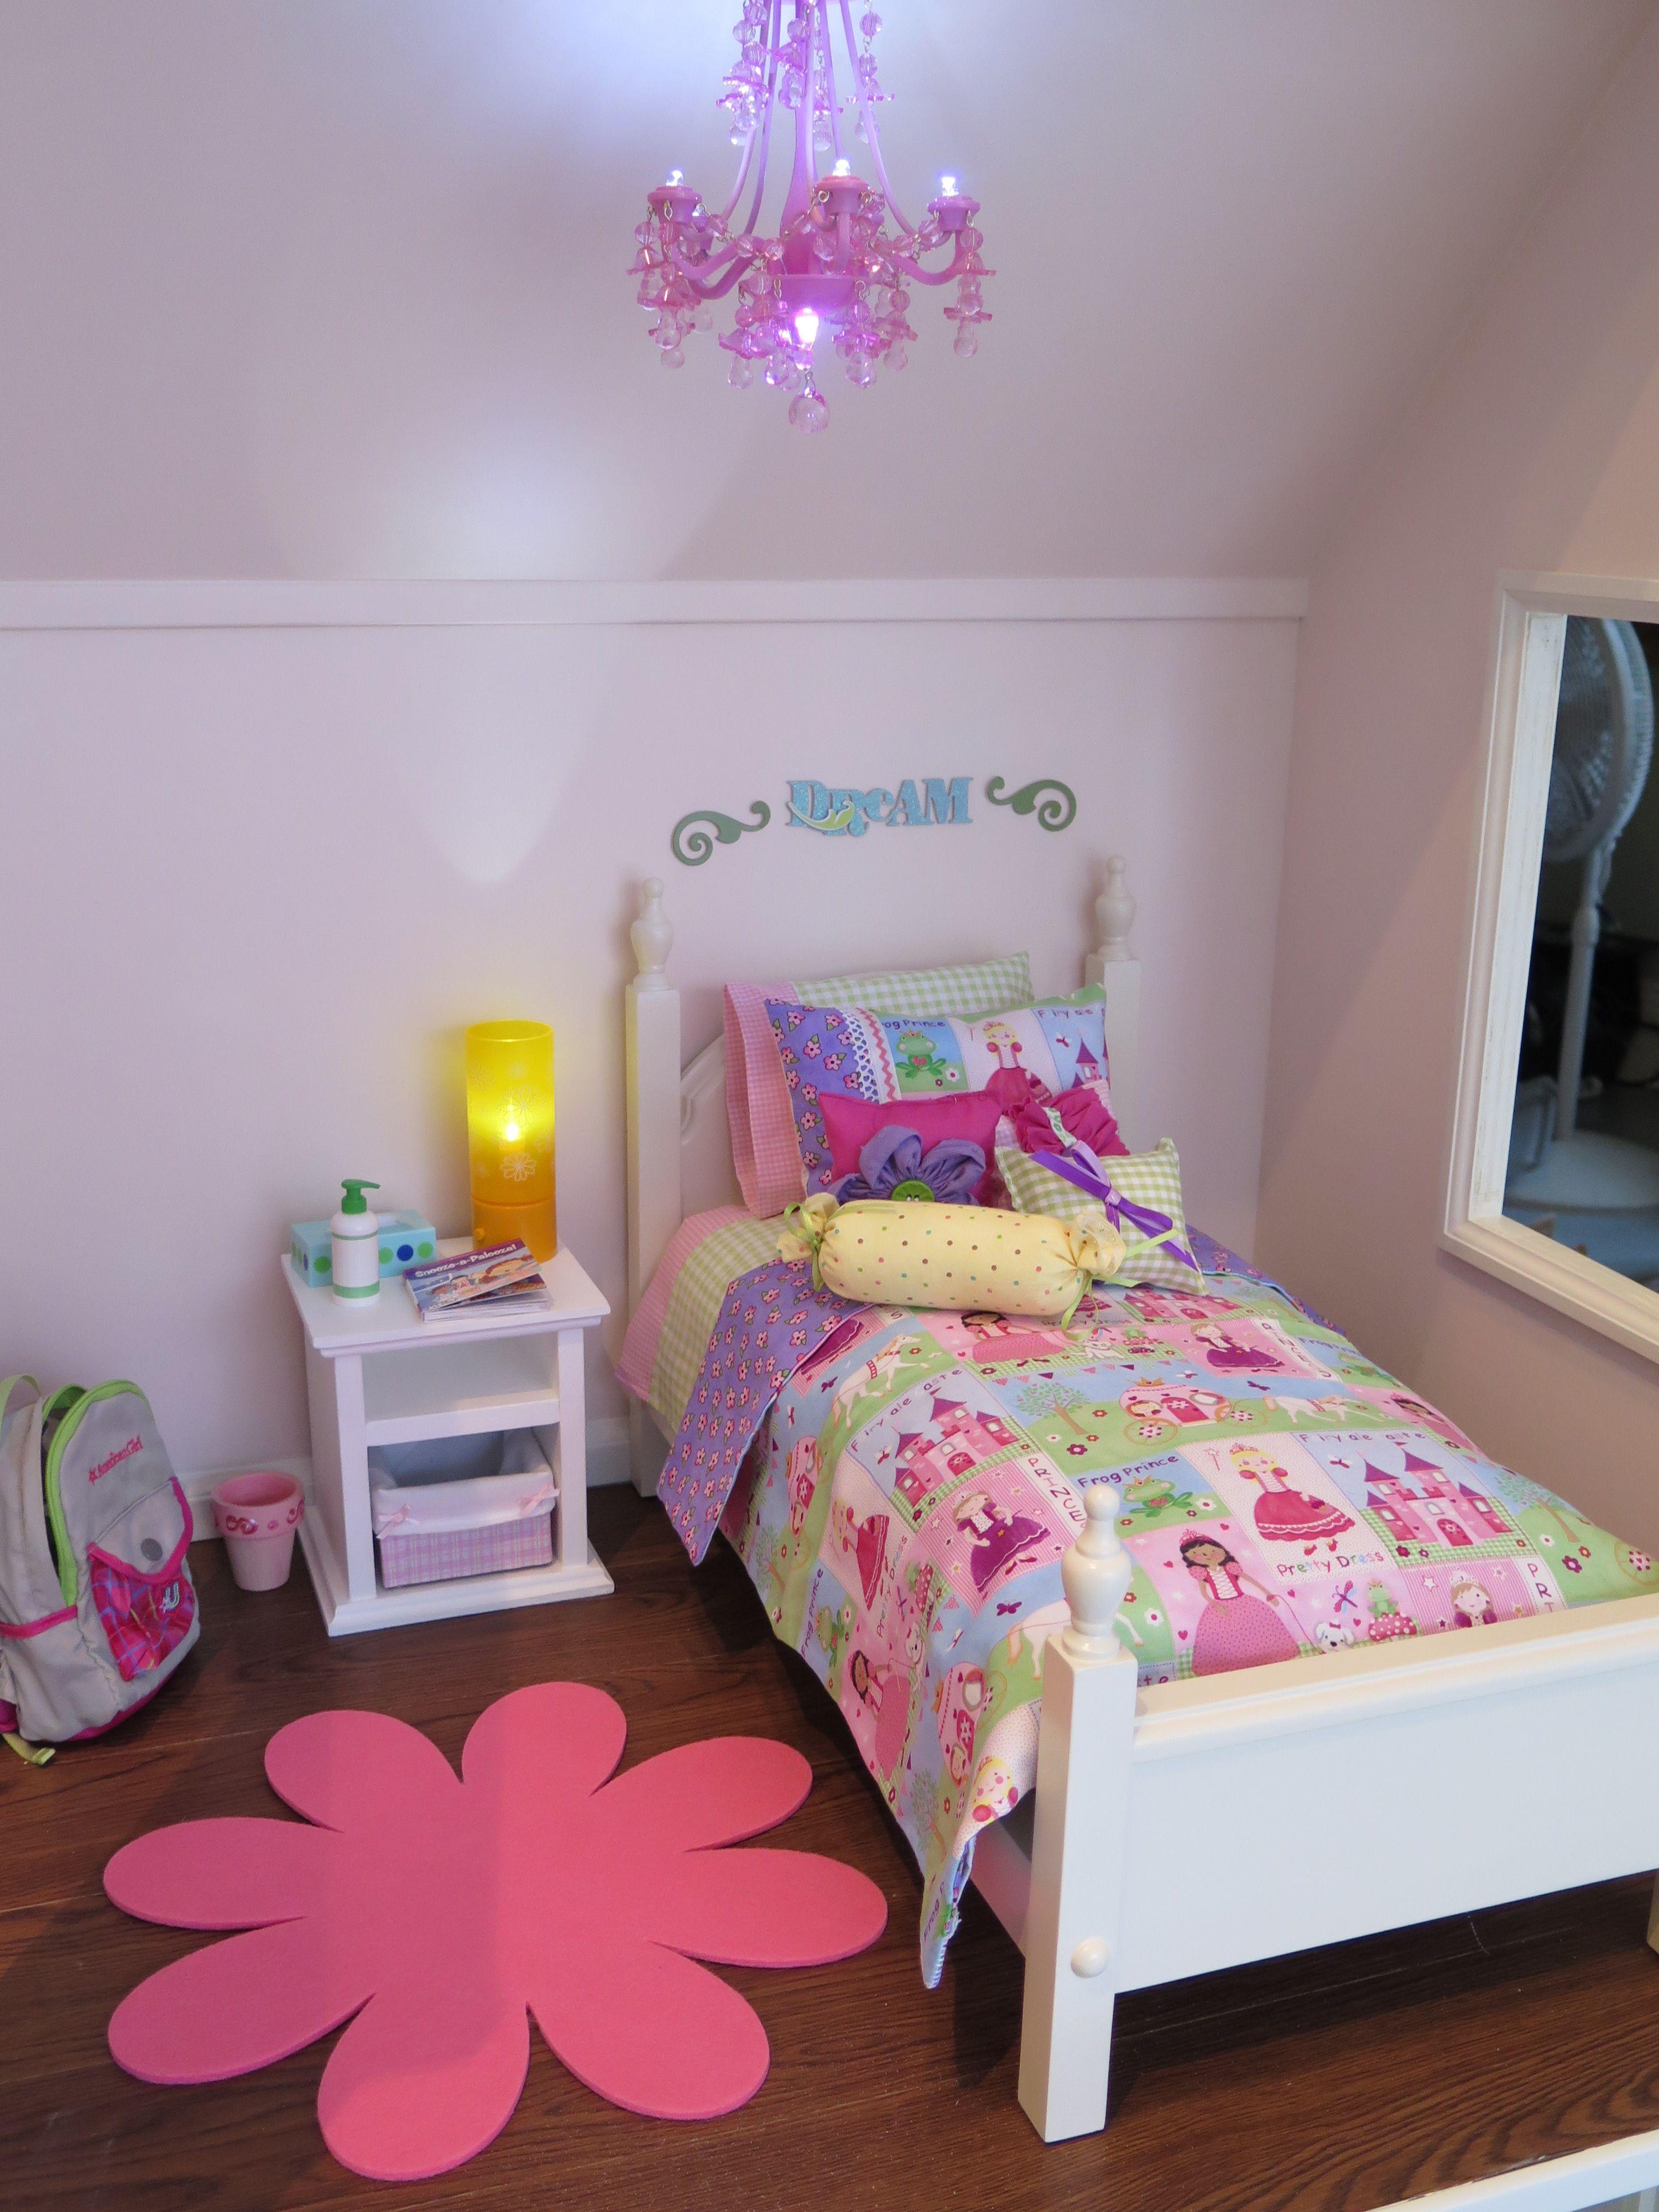 American girl bedroom decor bed bedding bedside table